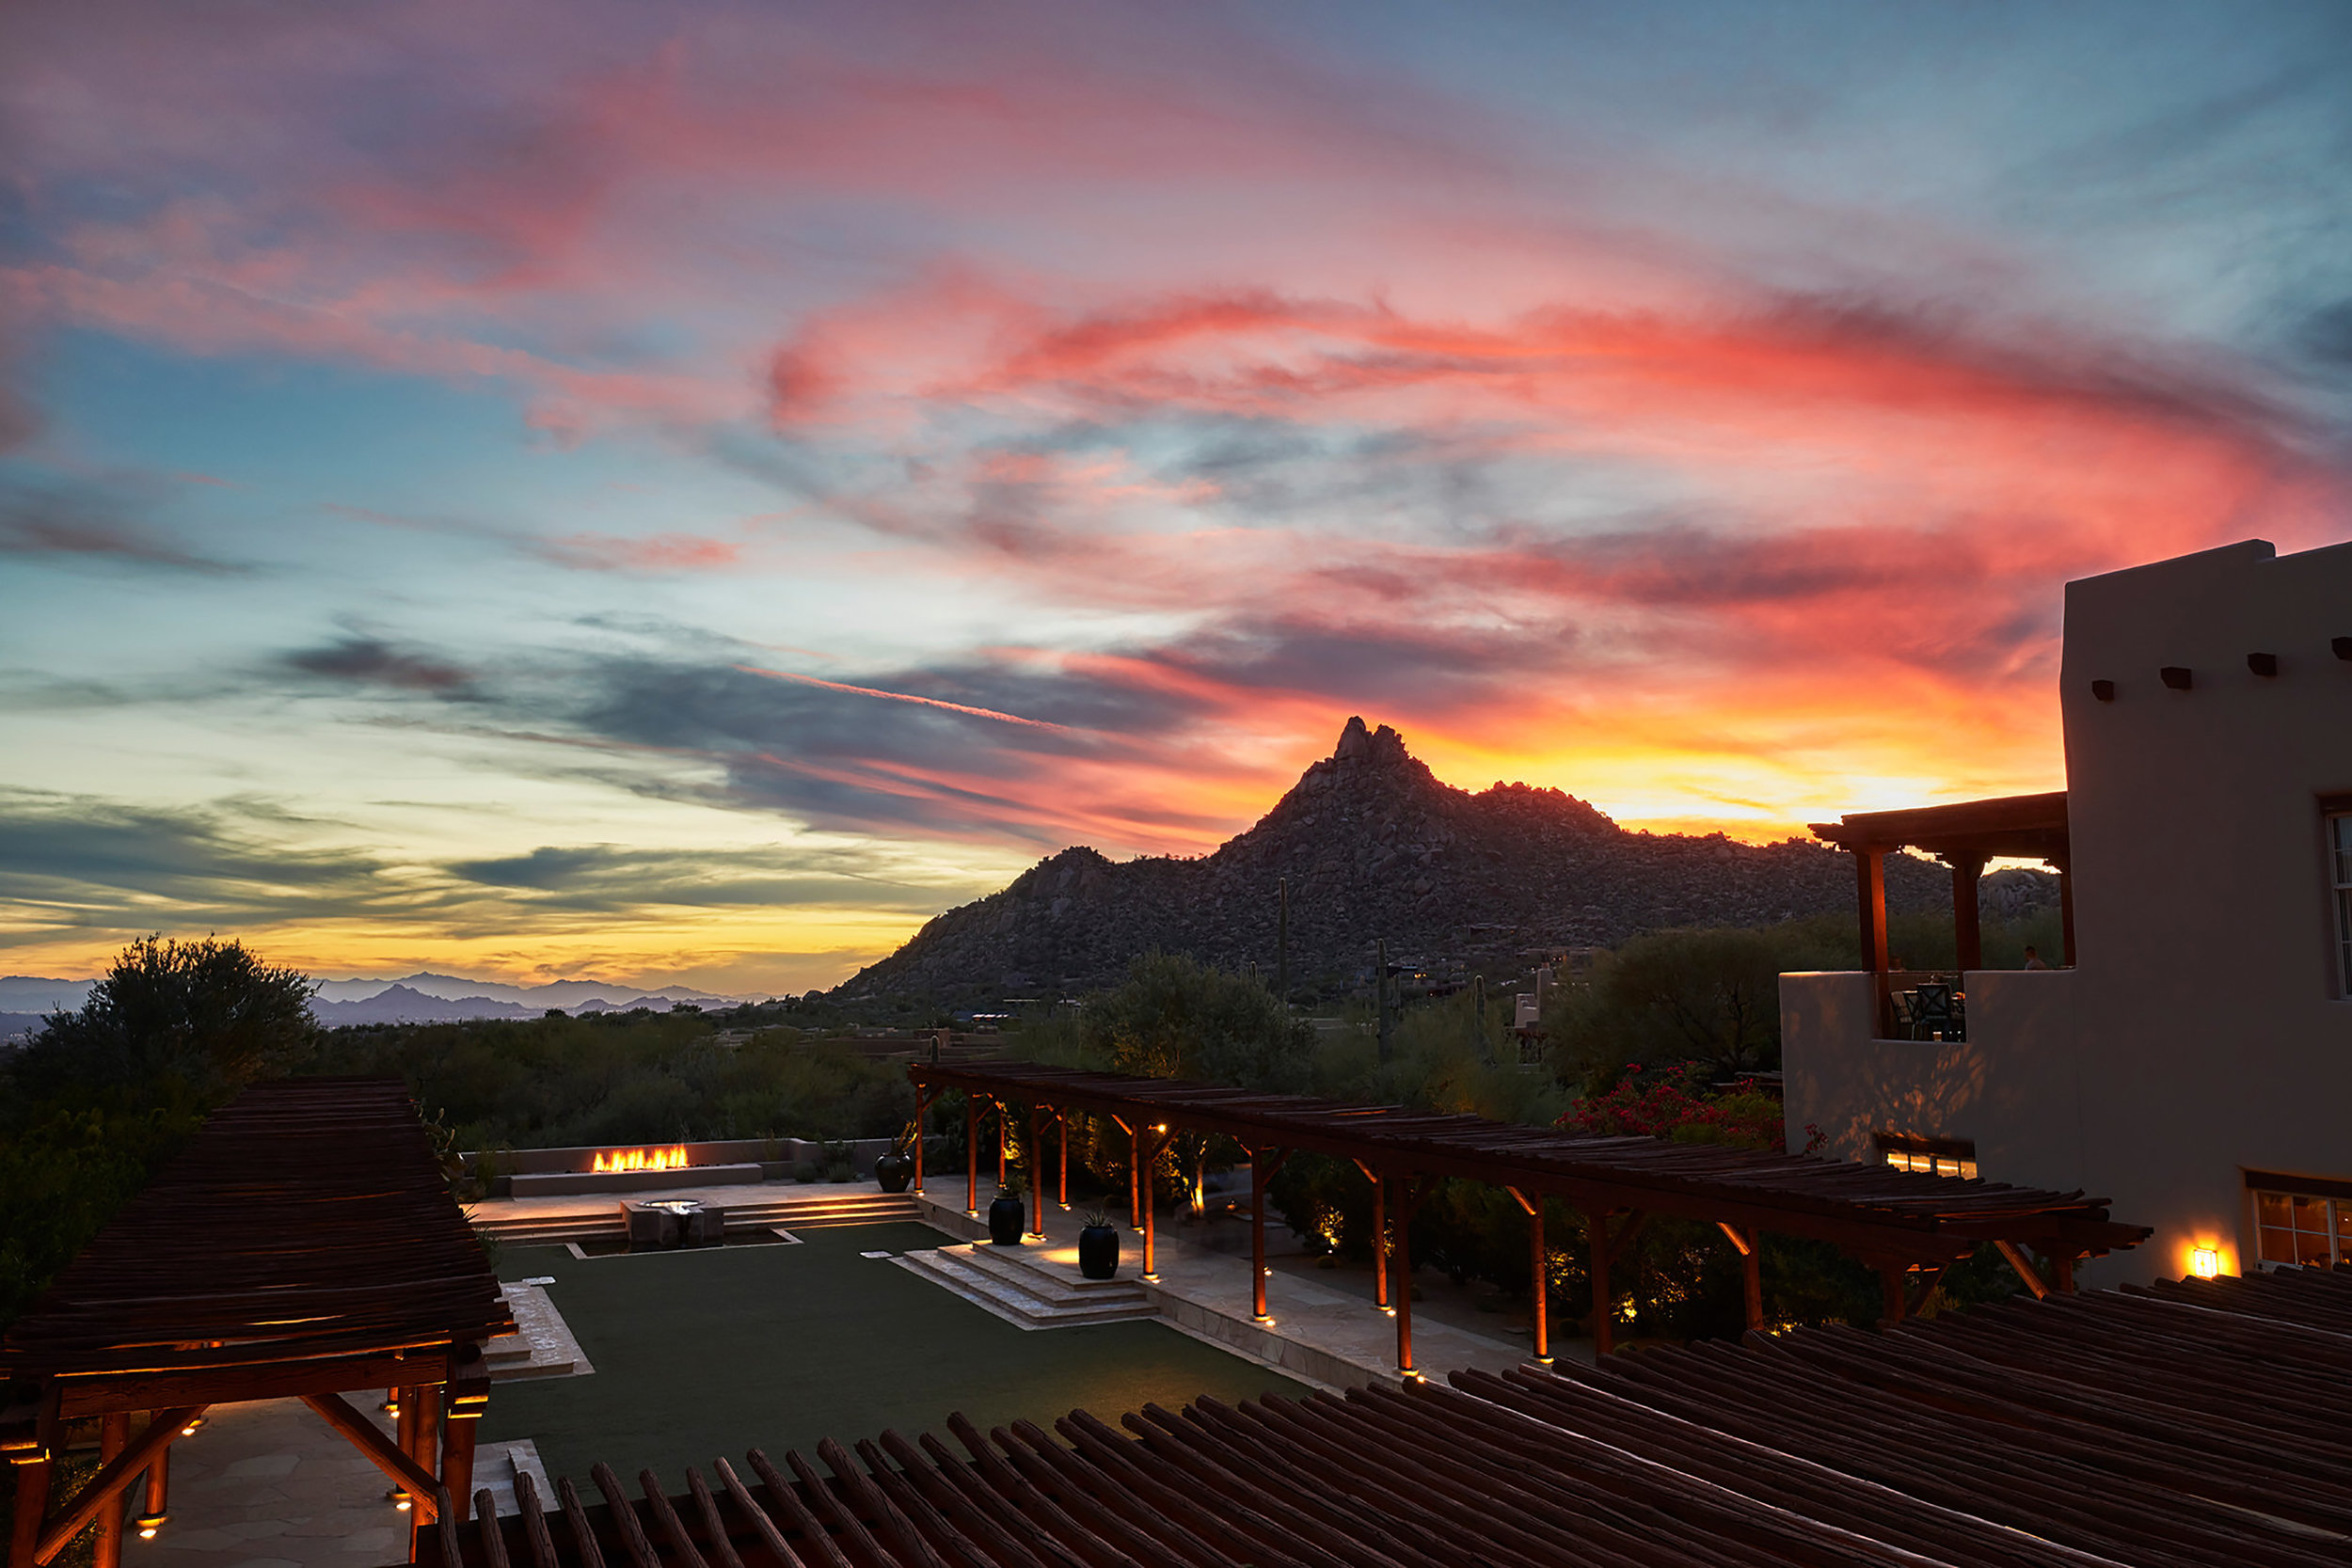 FS Scottsdale Sunset View from Onyx Patio SCO_1211.jpg